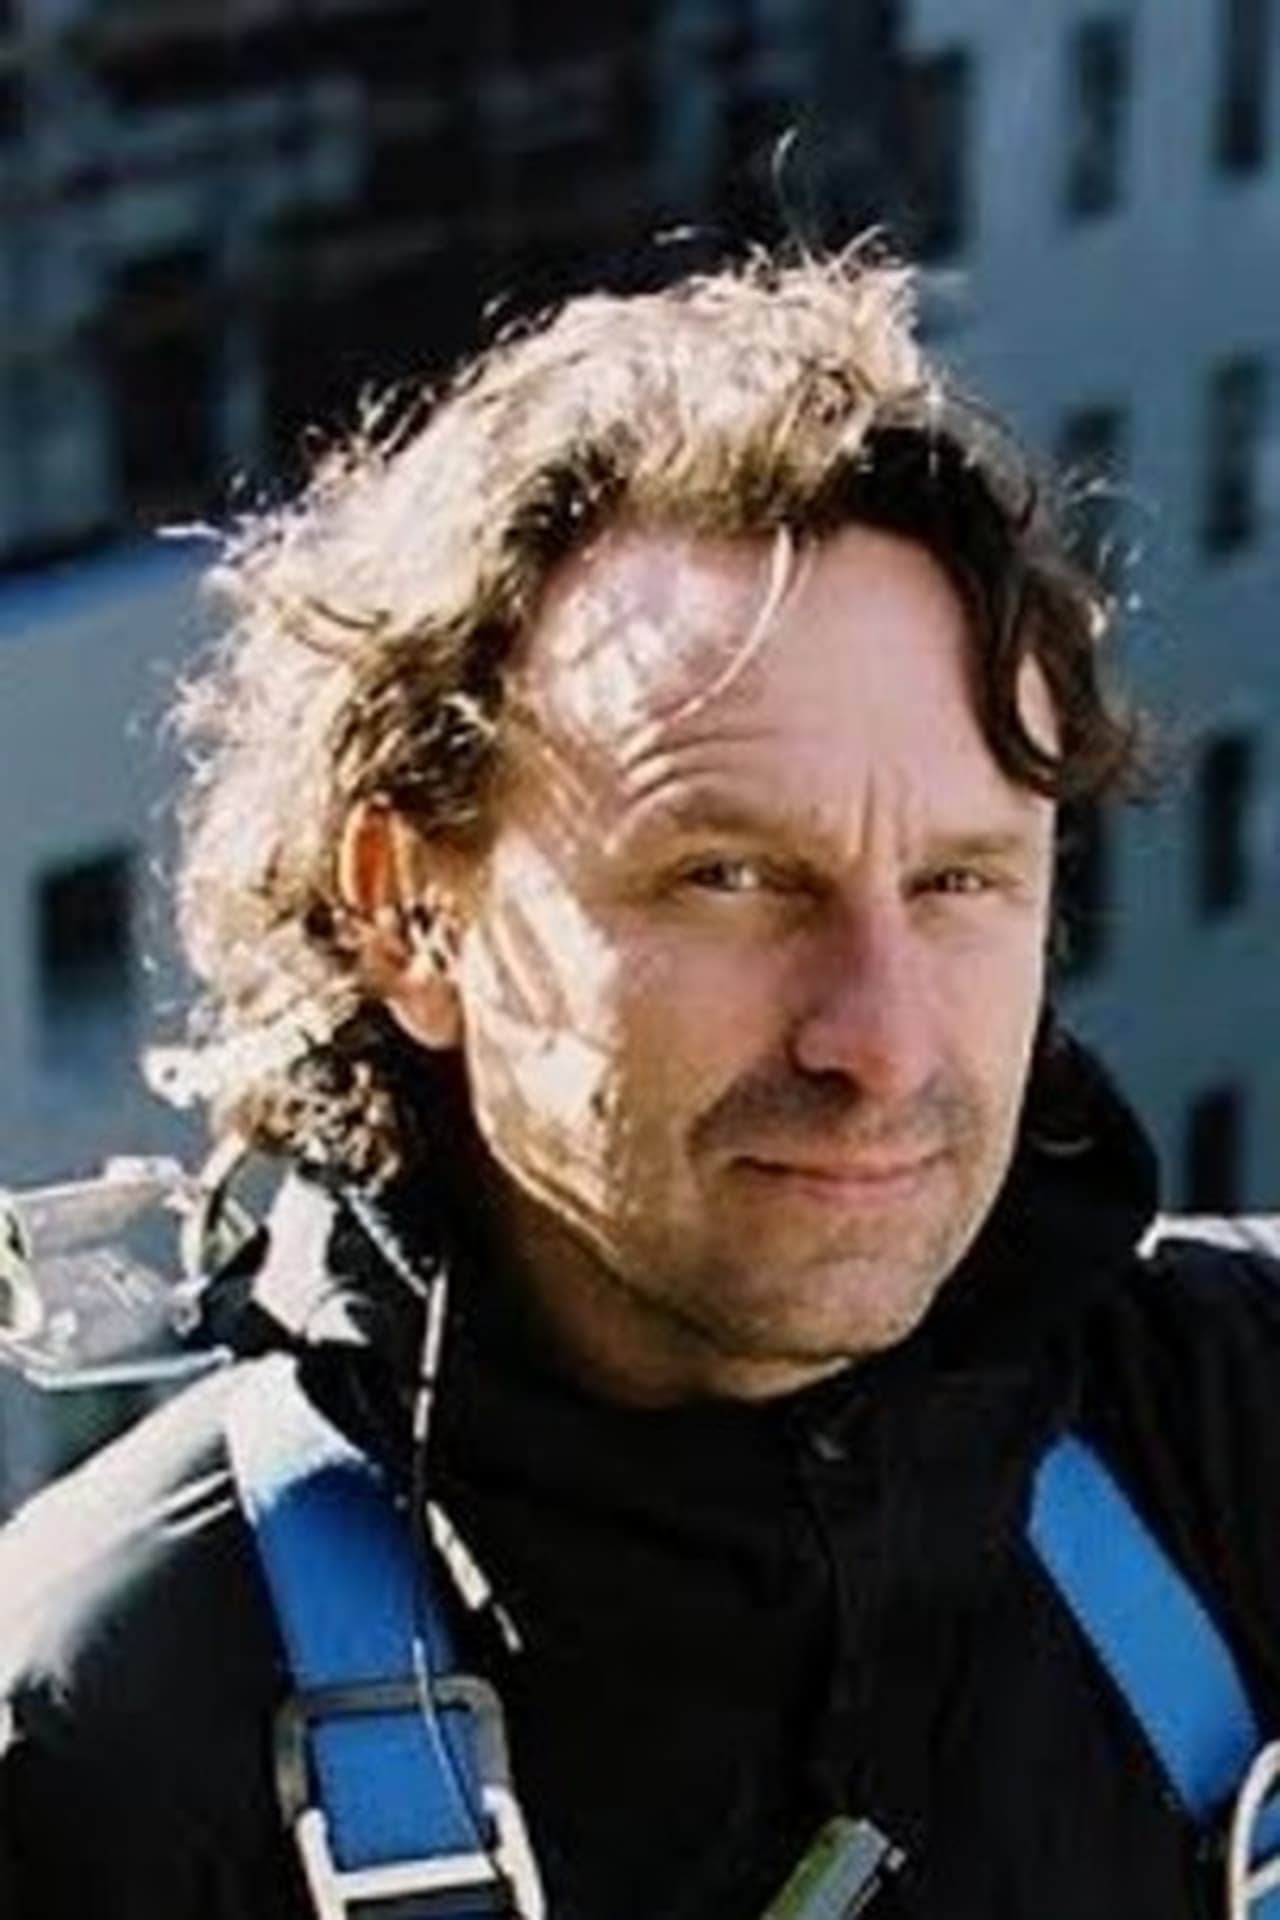 Petr Hlinomaz